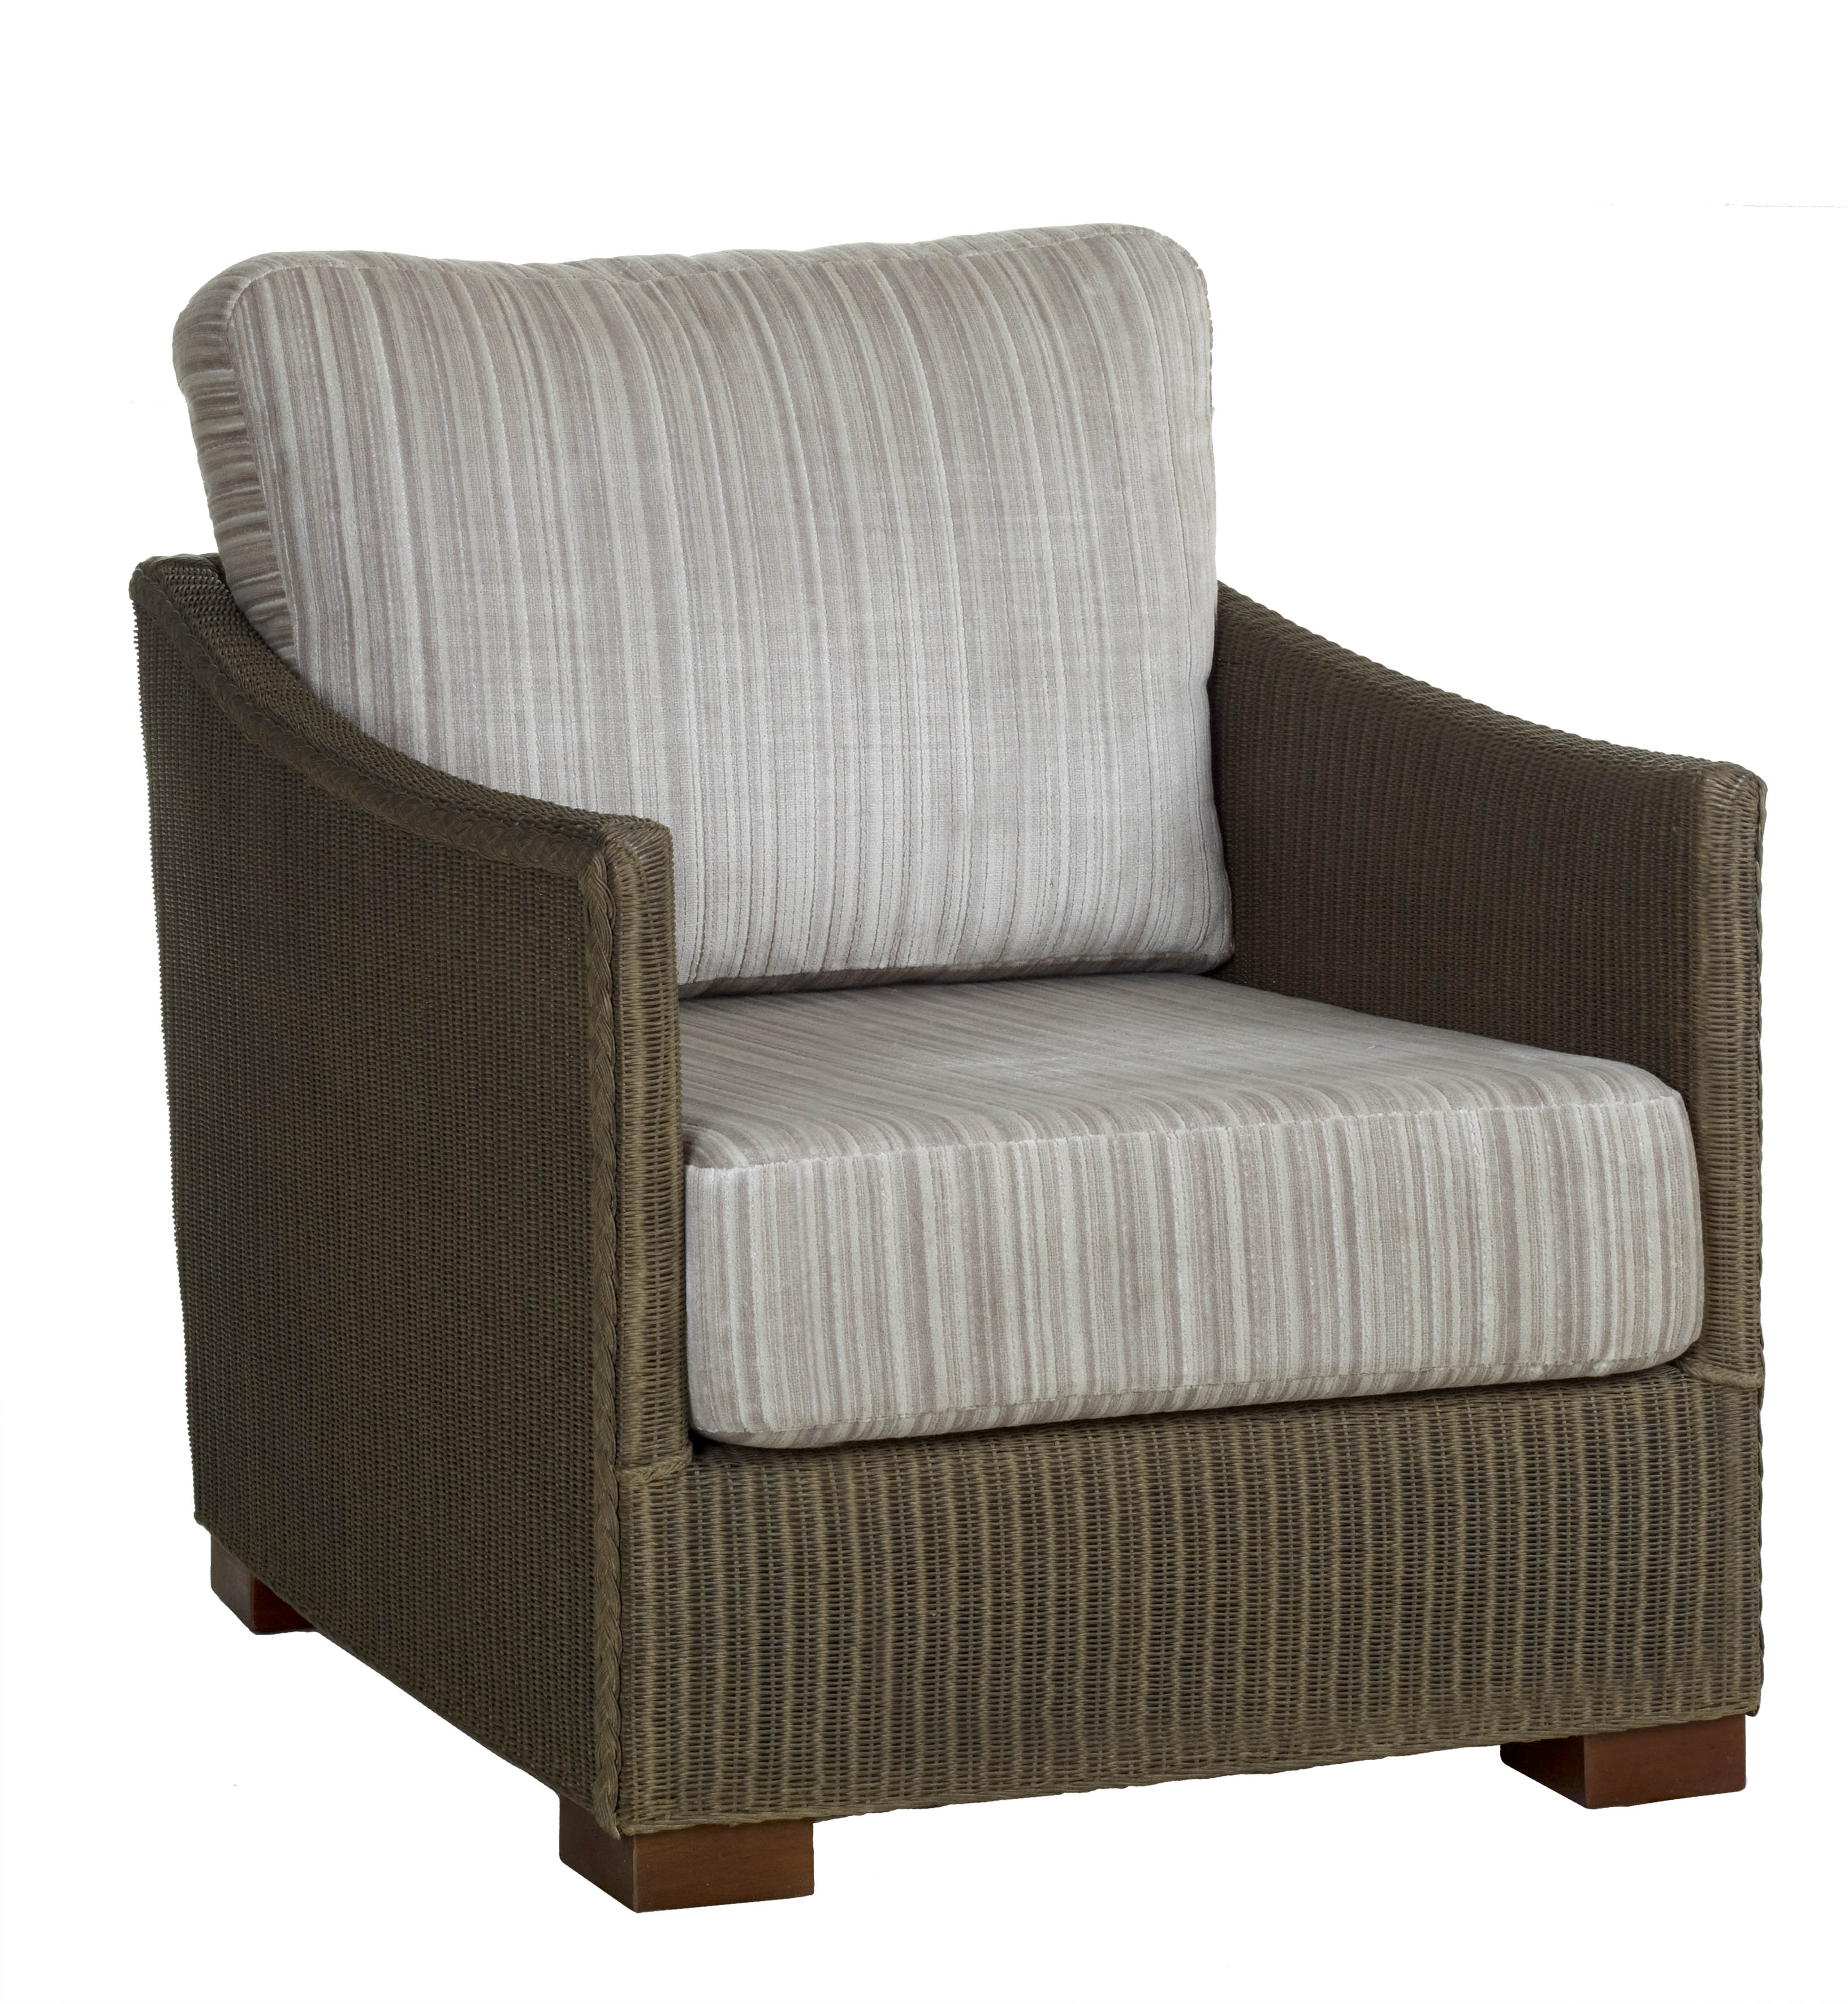 marylebone chair swindon